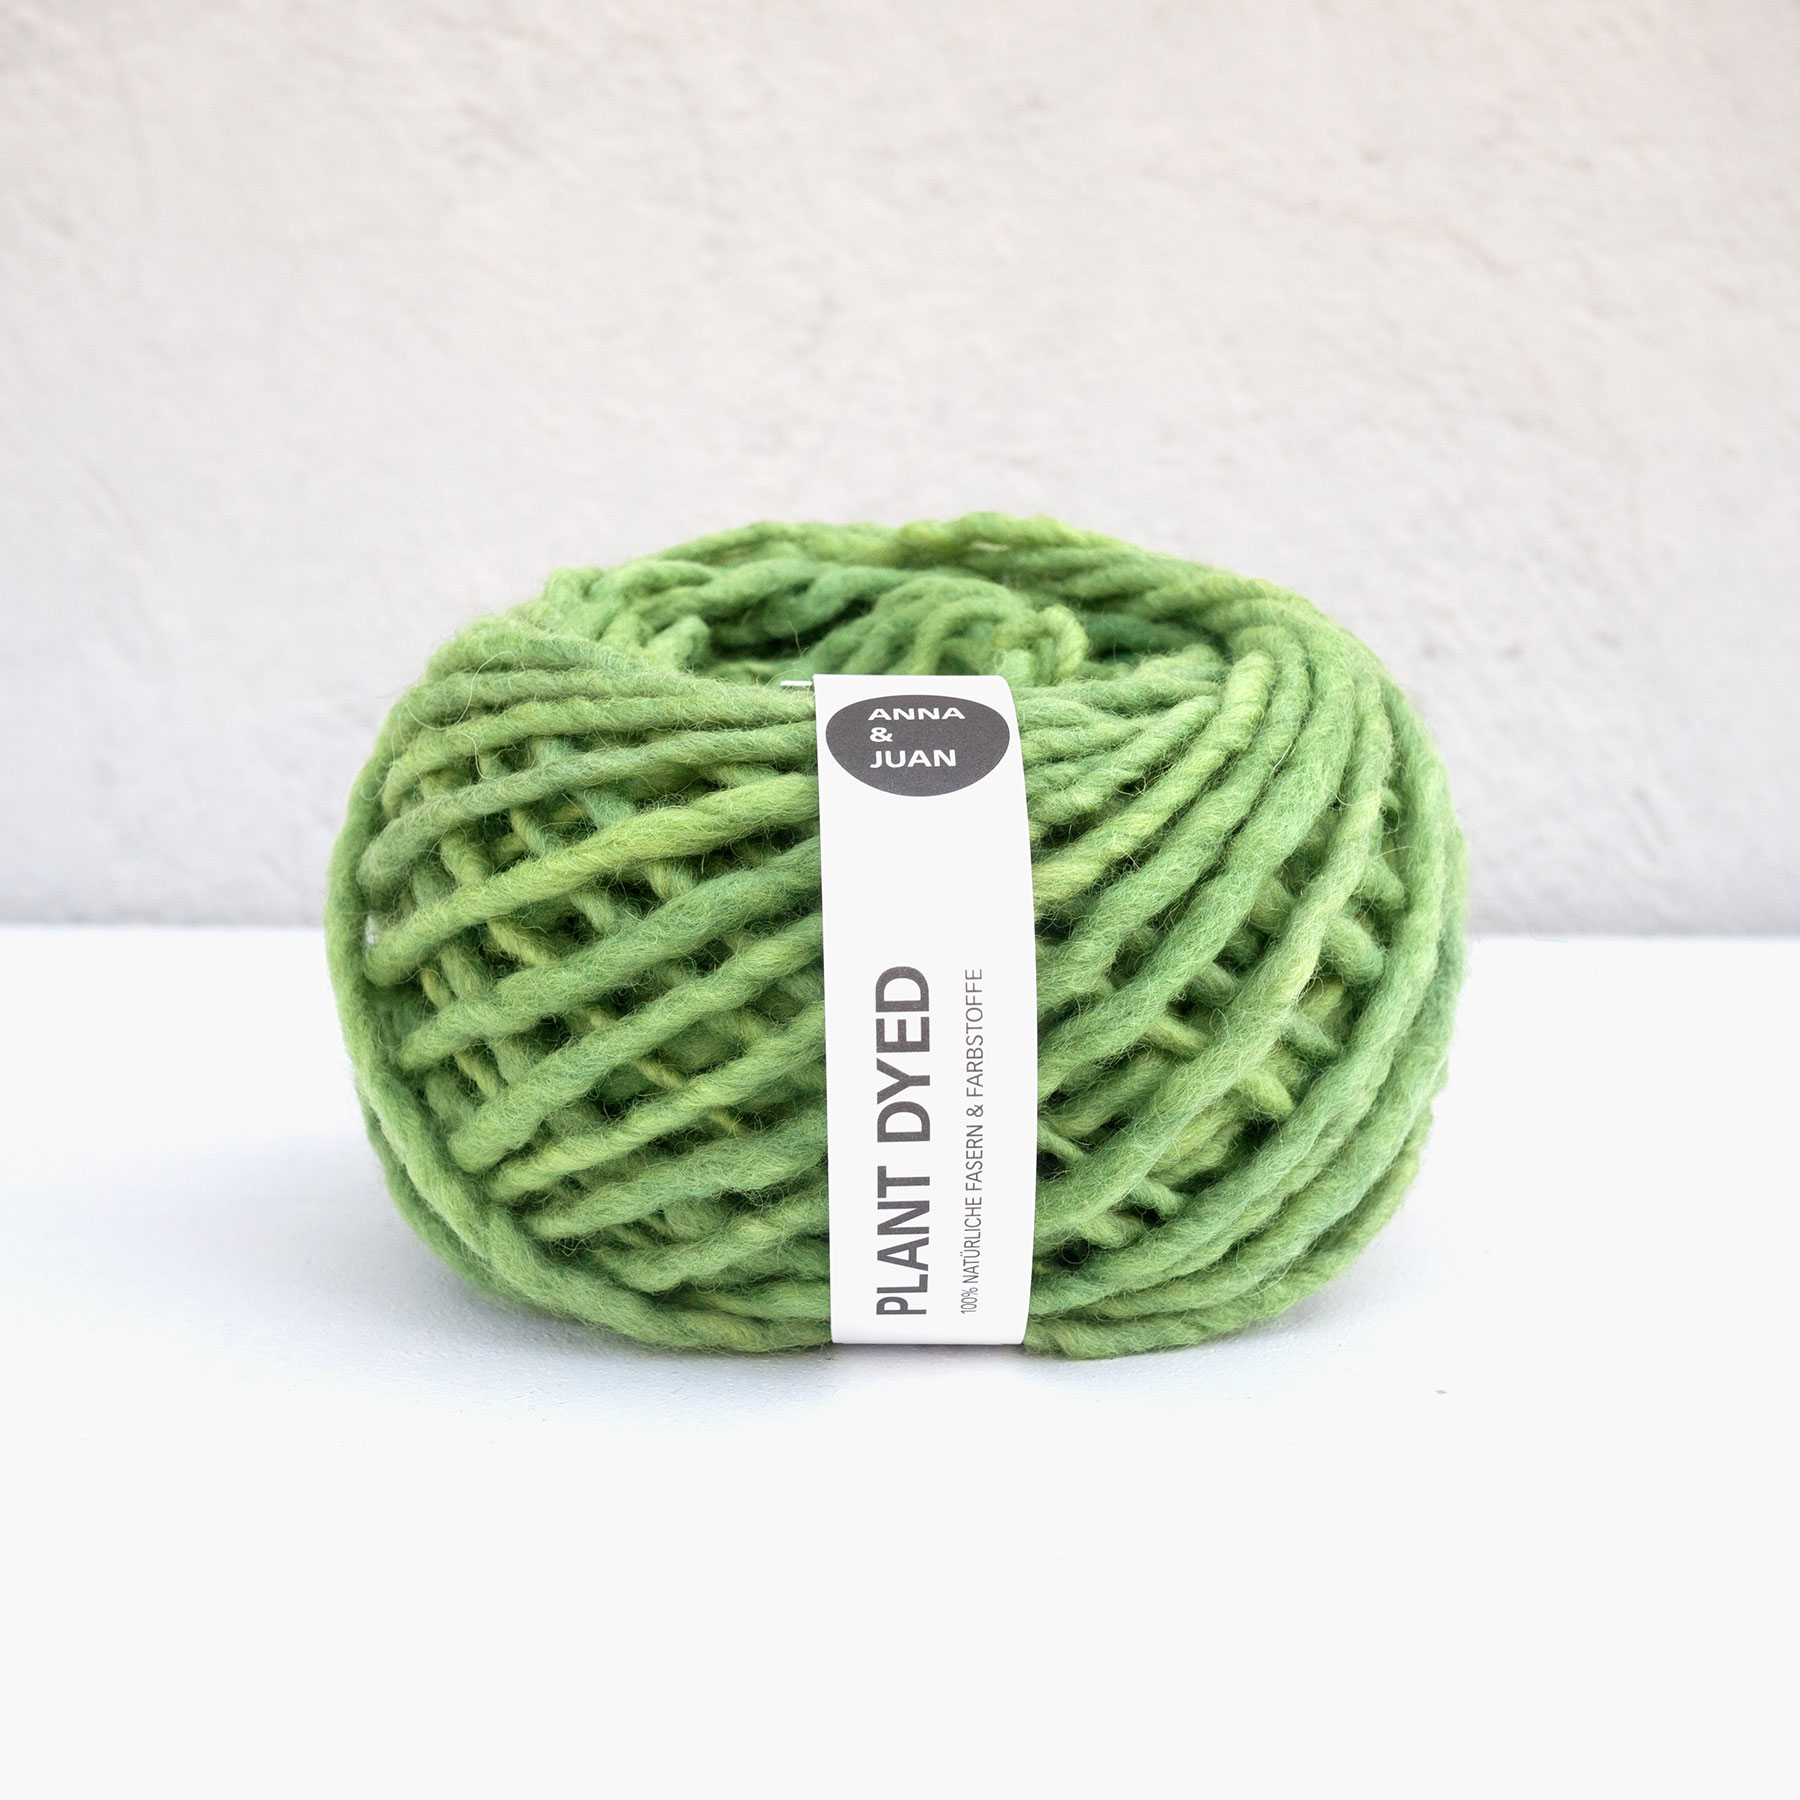 Anna & Juan Wolle «Plant Dyed» – Merino Handgesponnen – Super Bulky – Grasgrün